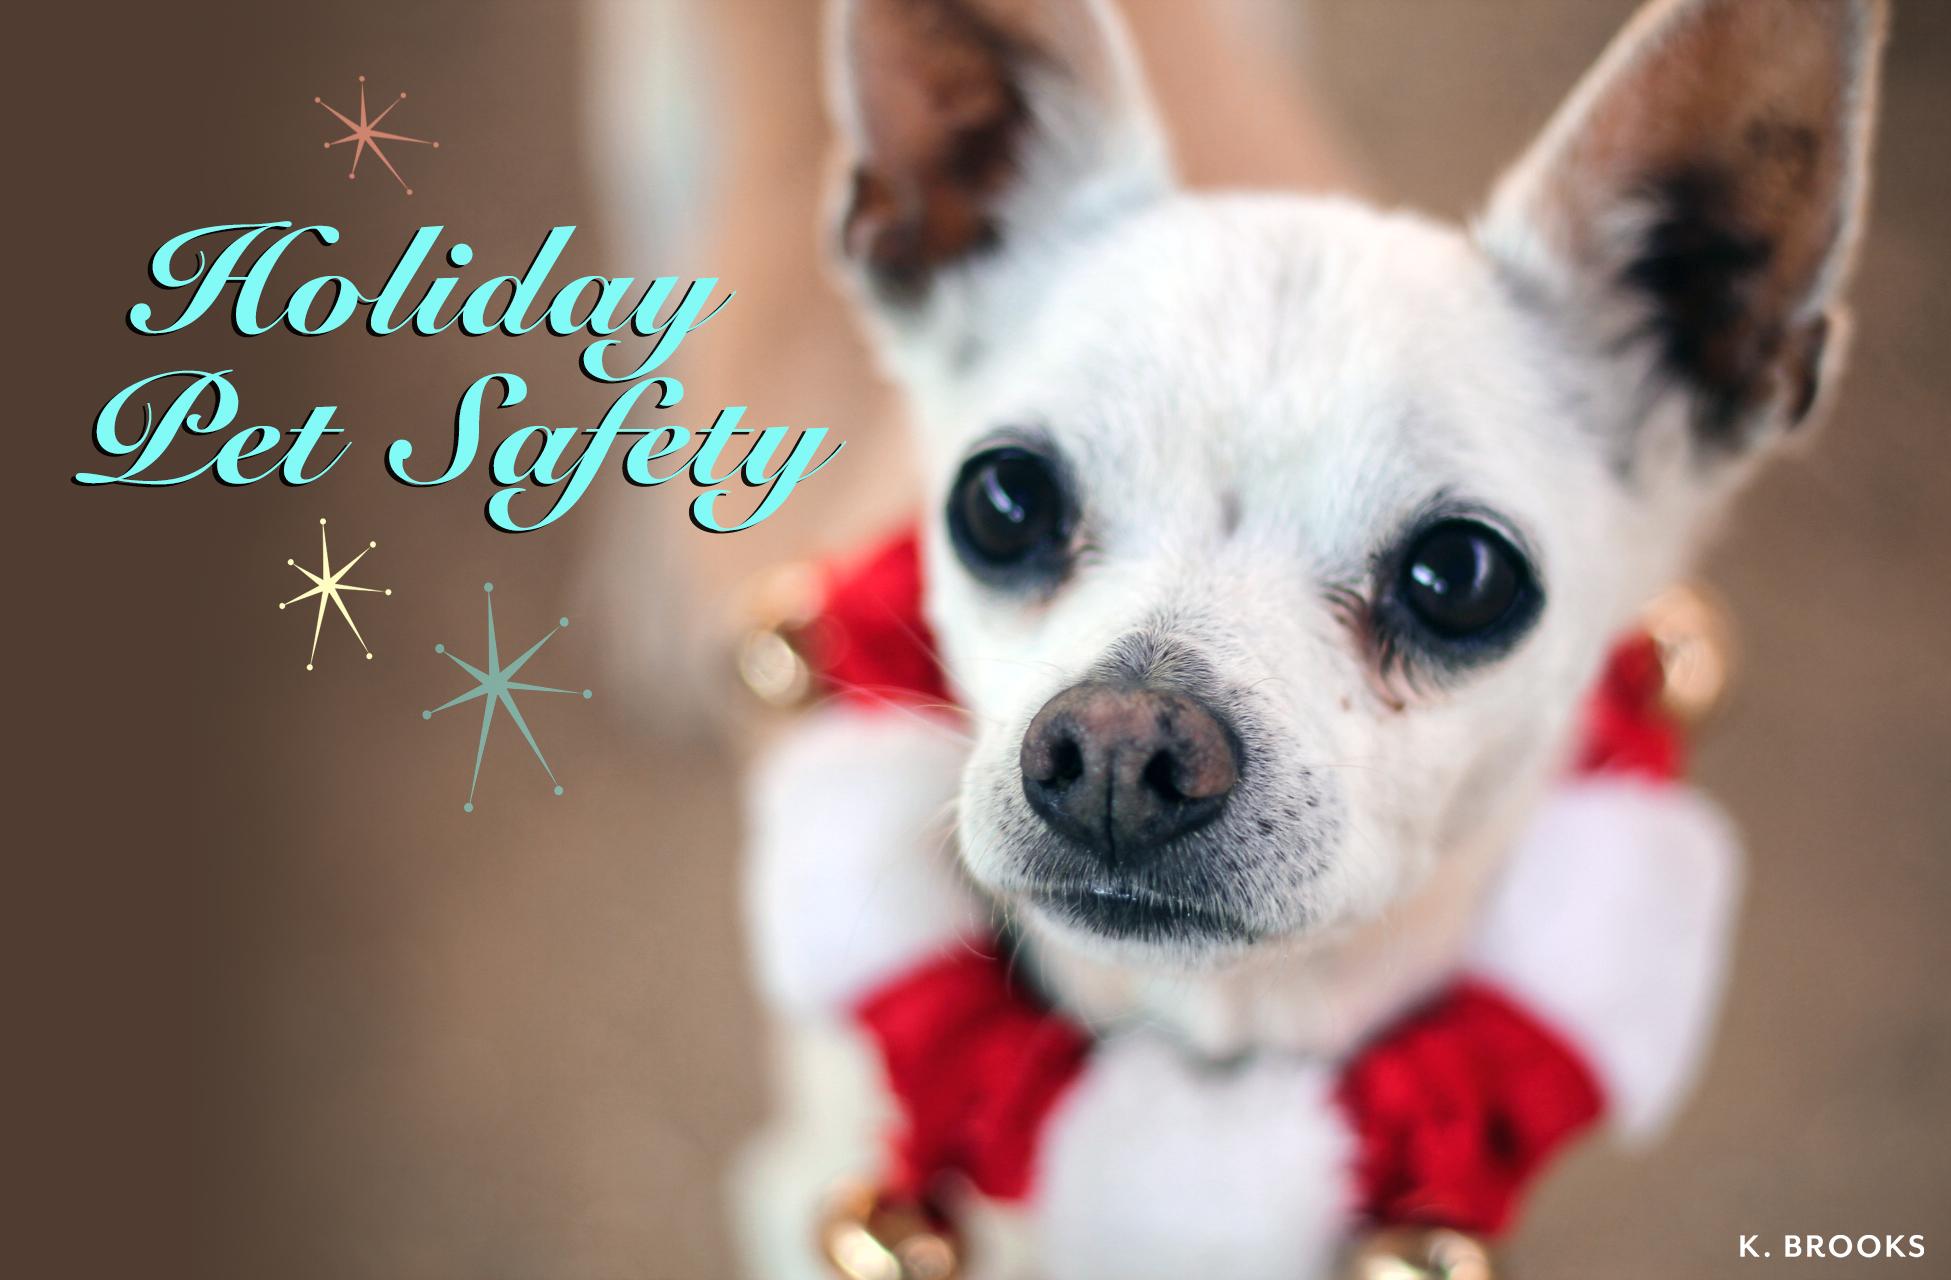 holiday.pet.safety.mogie.jpg